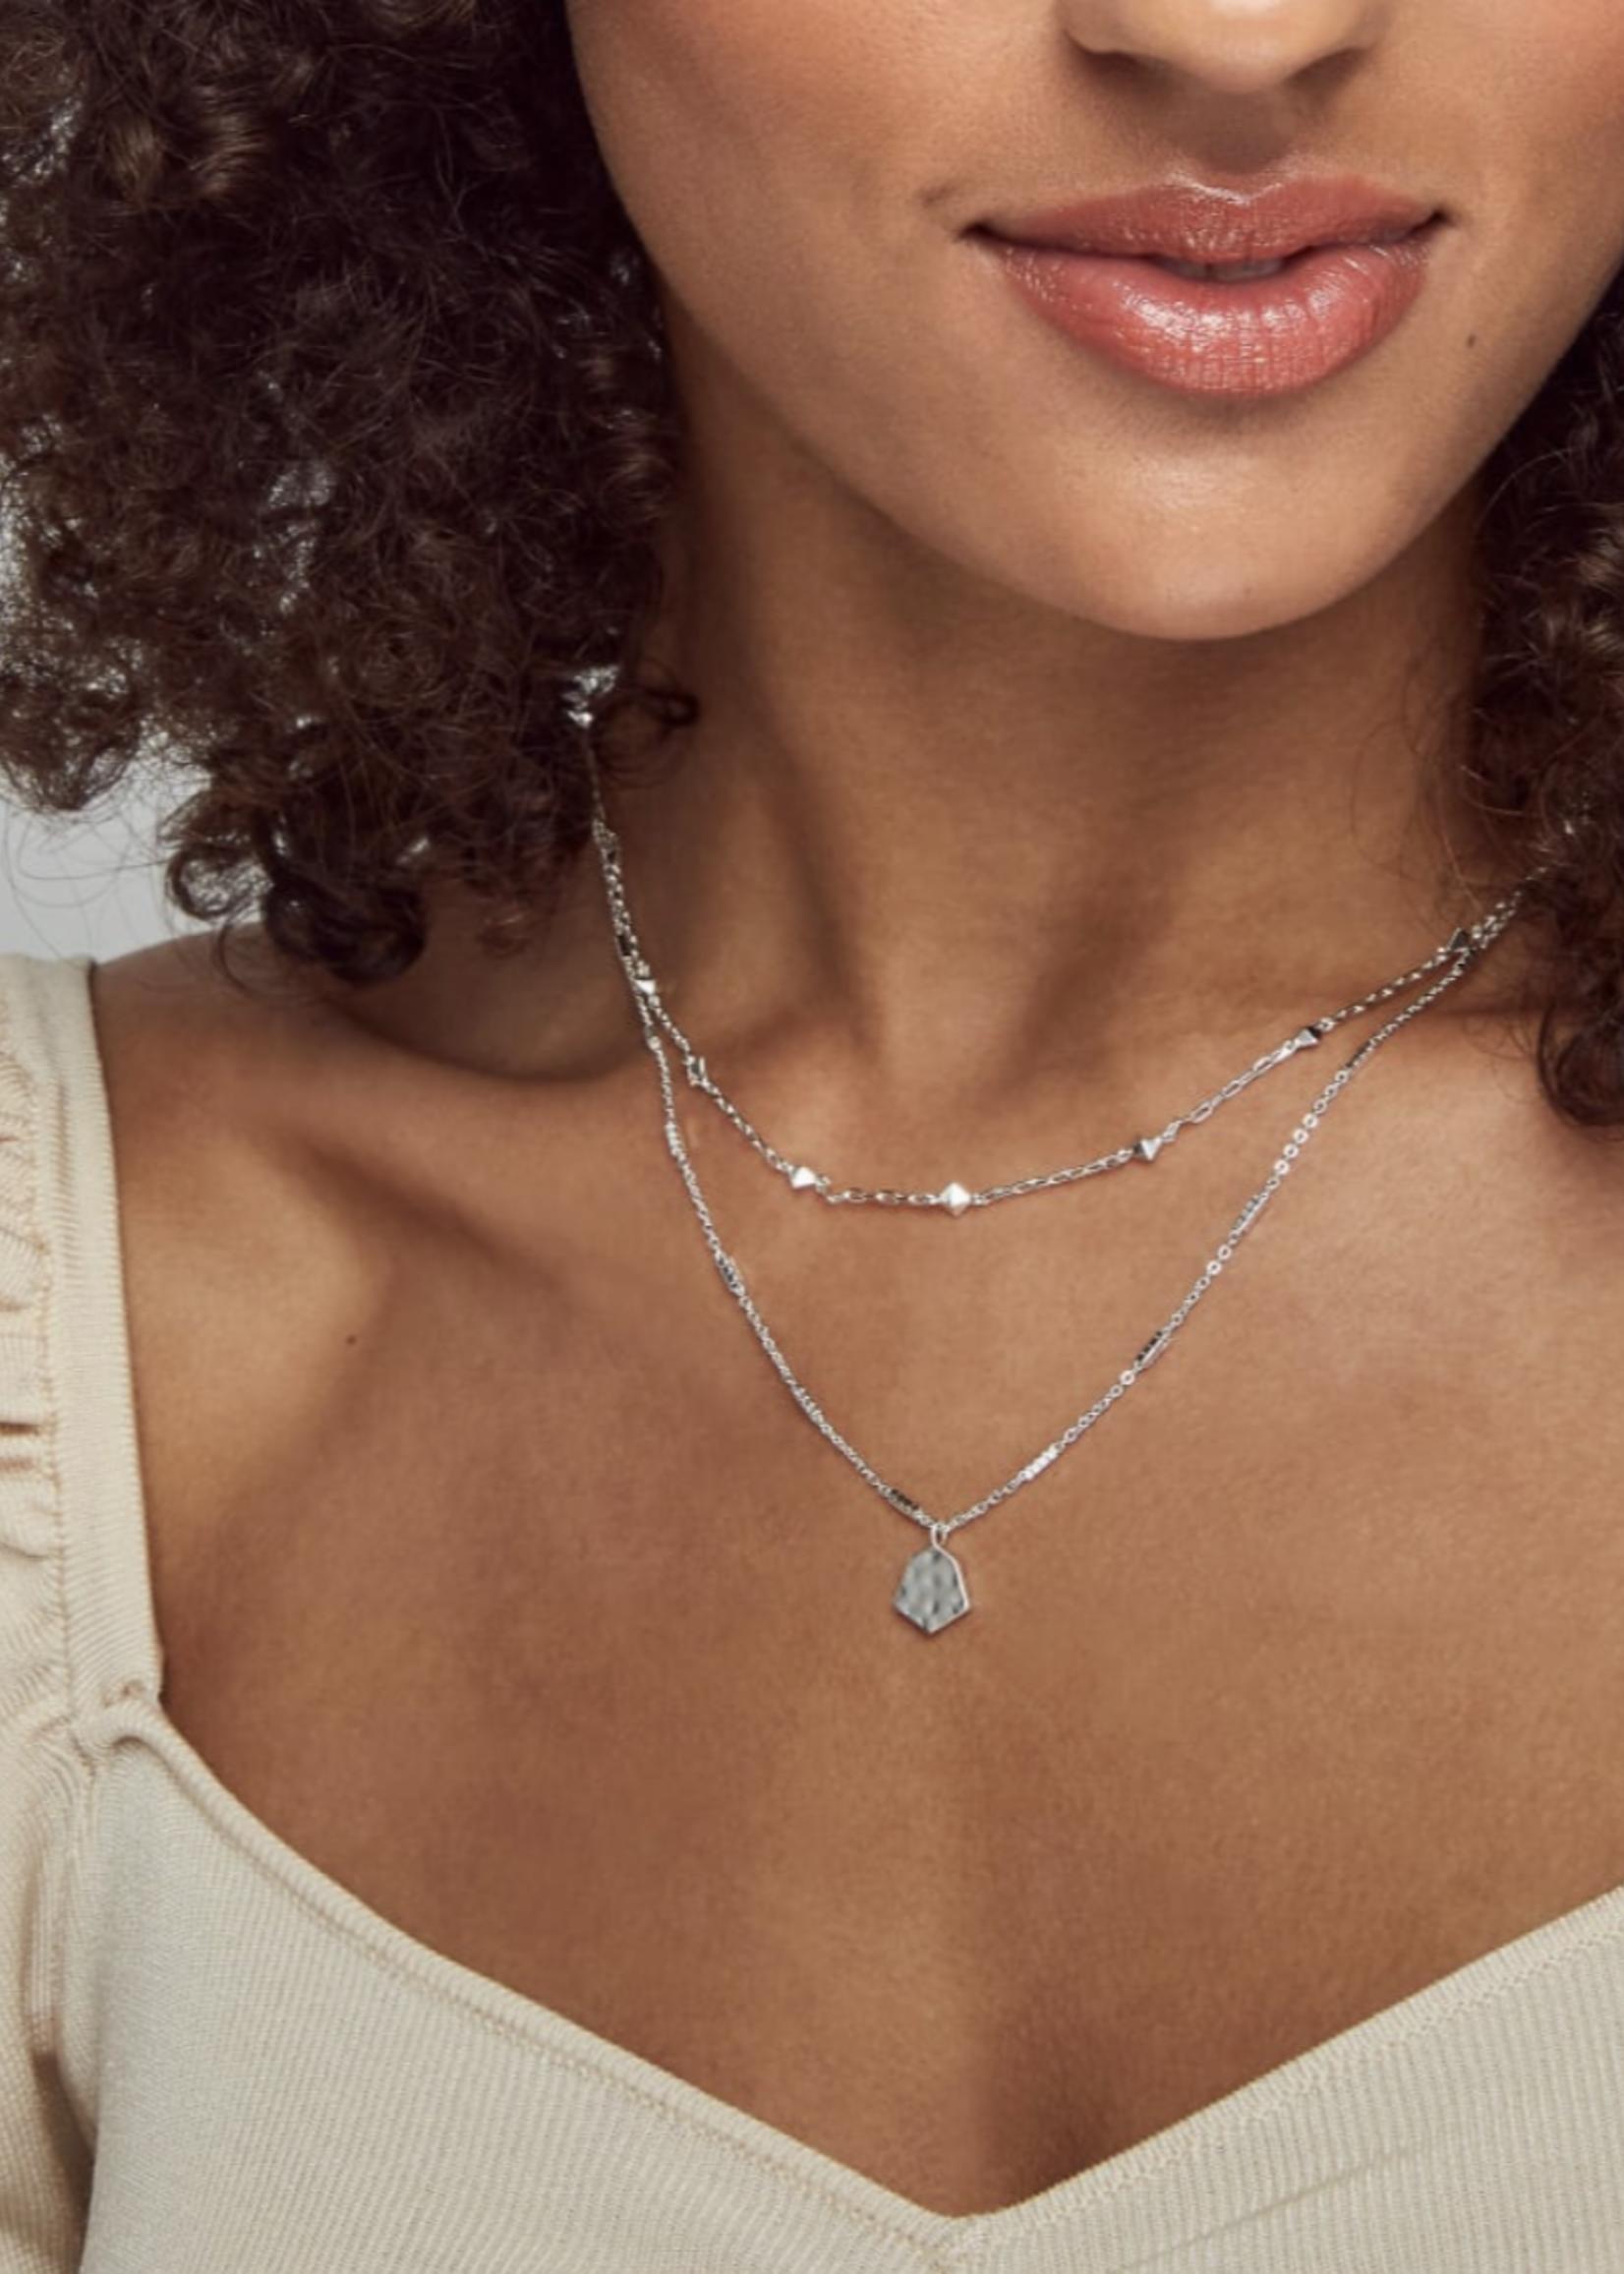 Kendra Scott Kendra Scott Clove Multi Strand Silver Necklace